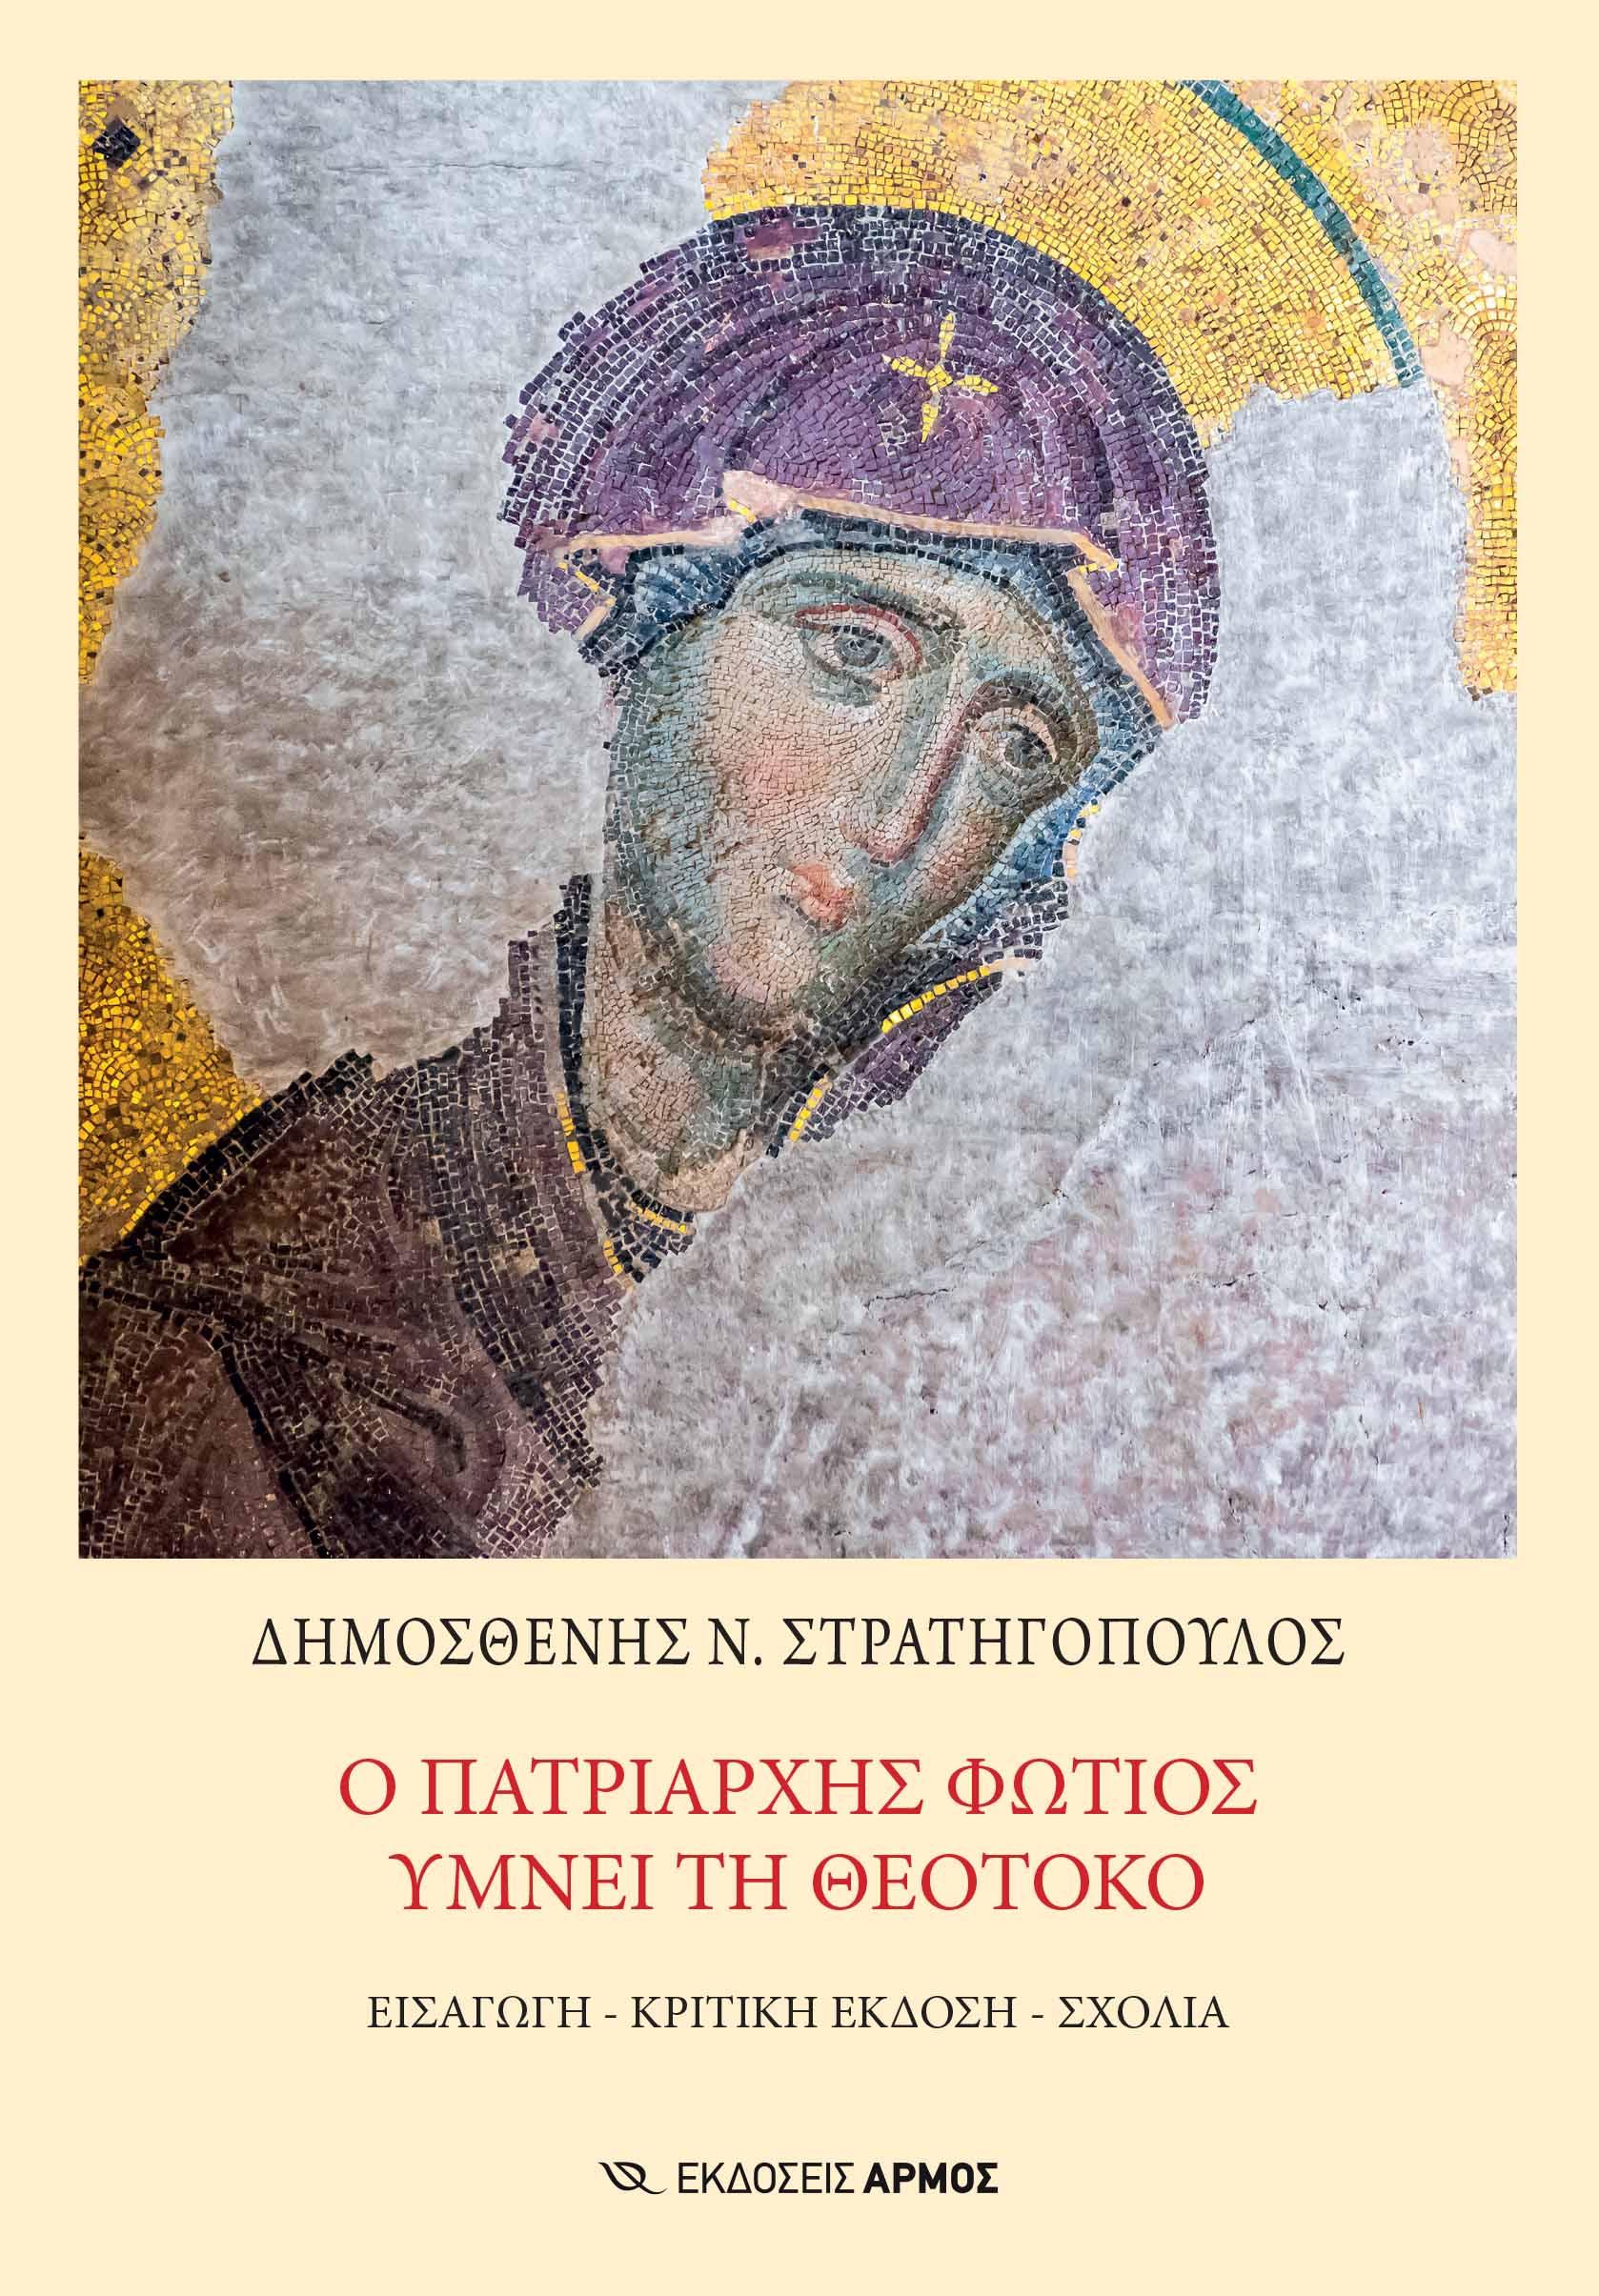 o patriarchis fotios ymnei